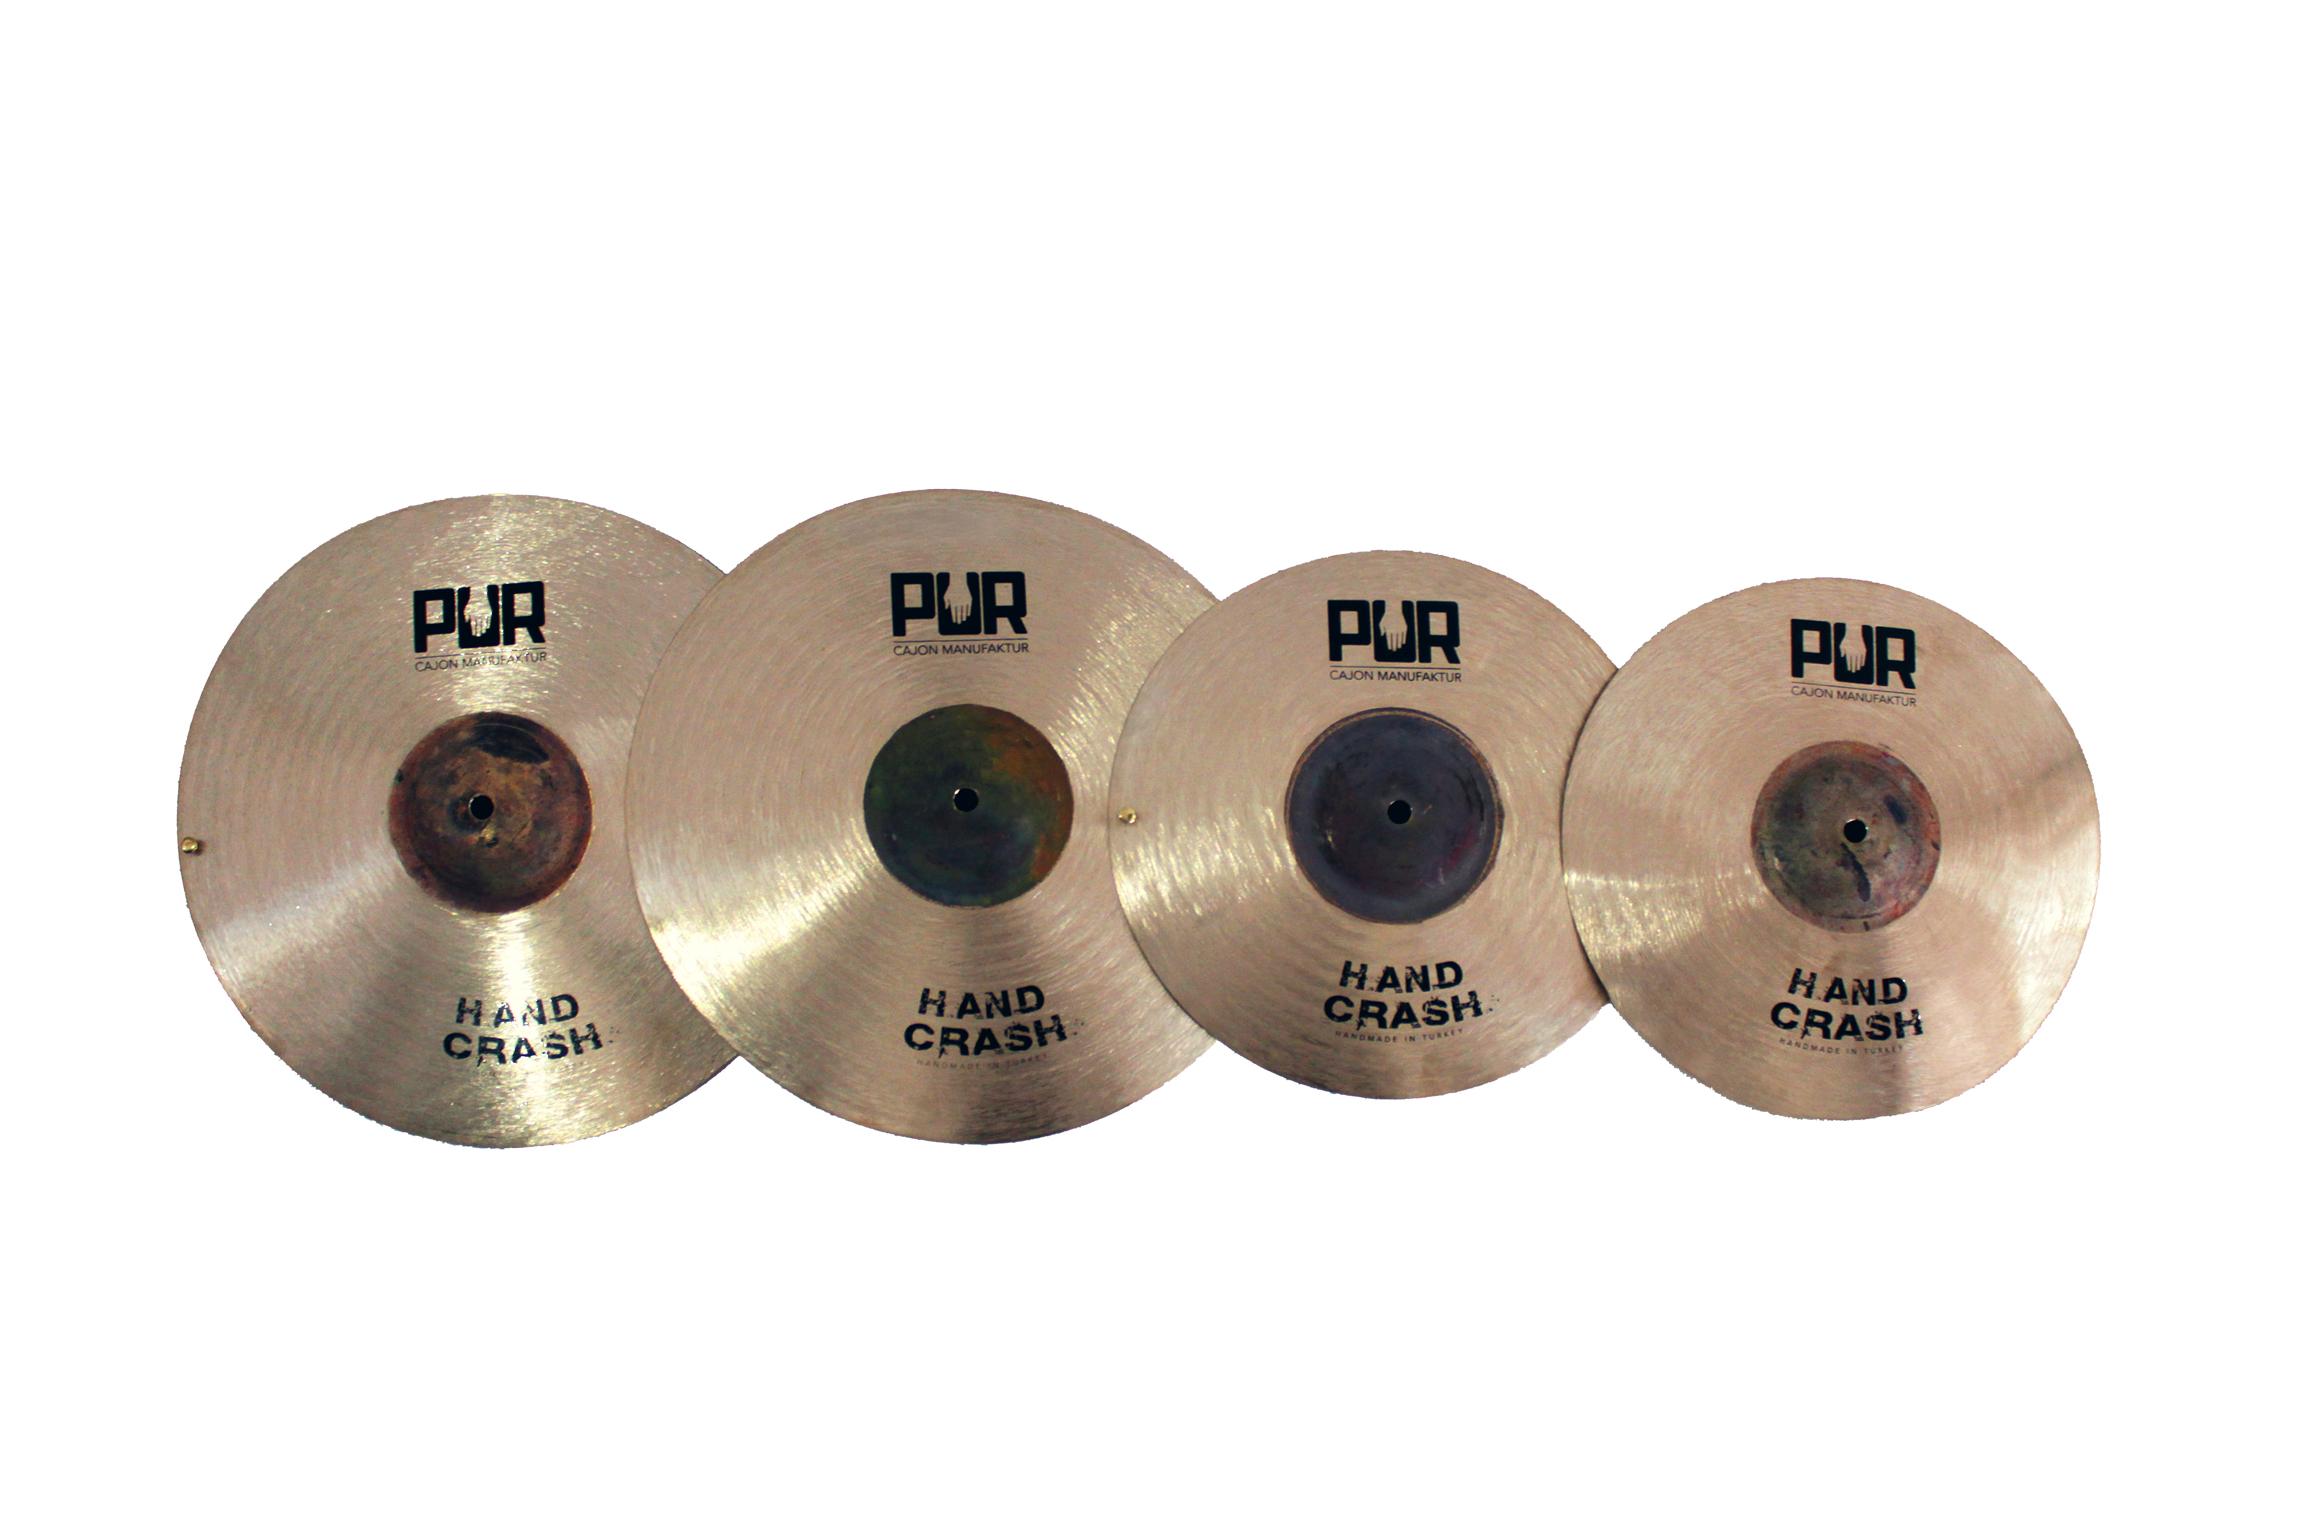 PUR-Cajon-Hand Crash-Manufaktur-Music-Instrument-Drum-Handmade